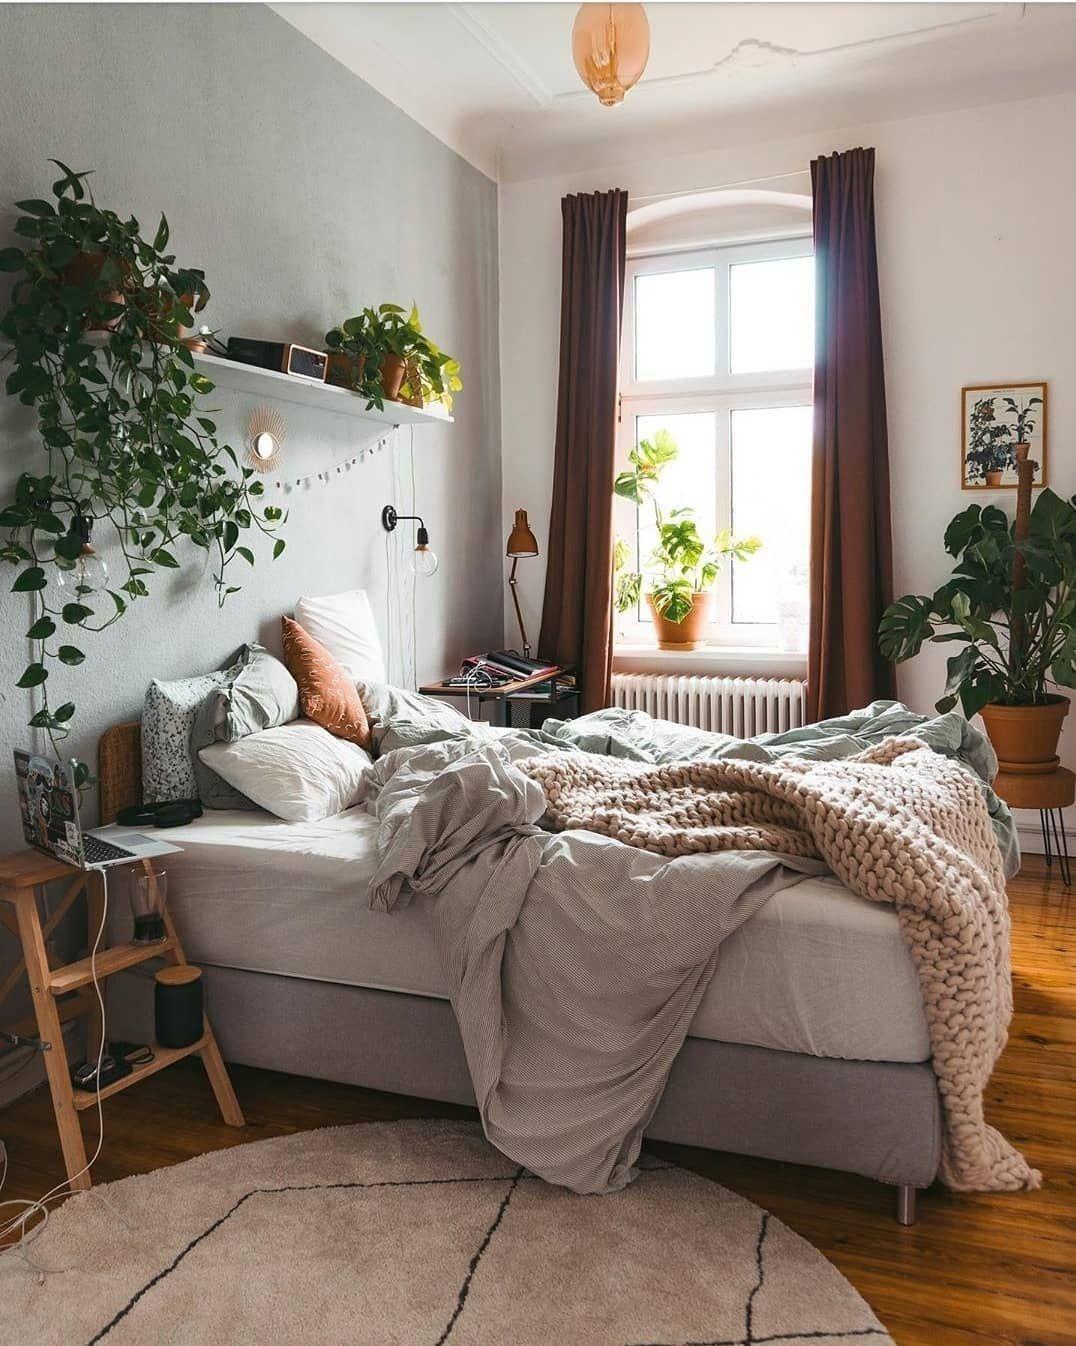 How To Decor Your Bedroom Bedroom Decor Ideas Yellow 1920s Bedroom Decor 197 1000 In 2020 Bedroom Decor Decor Home